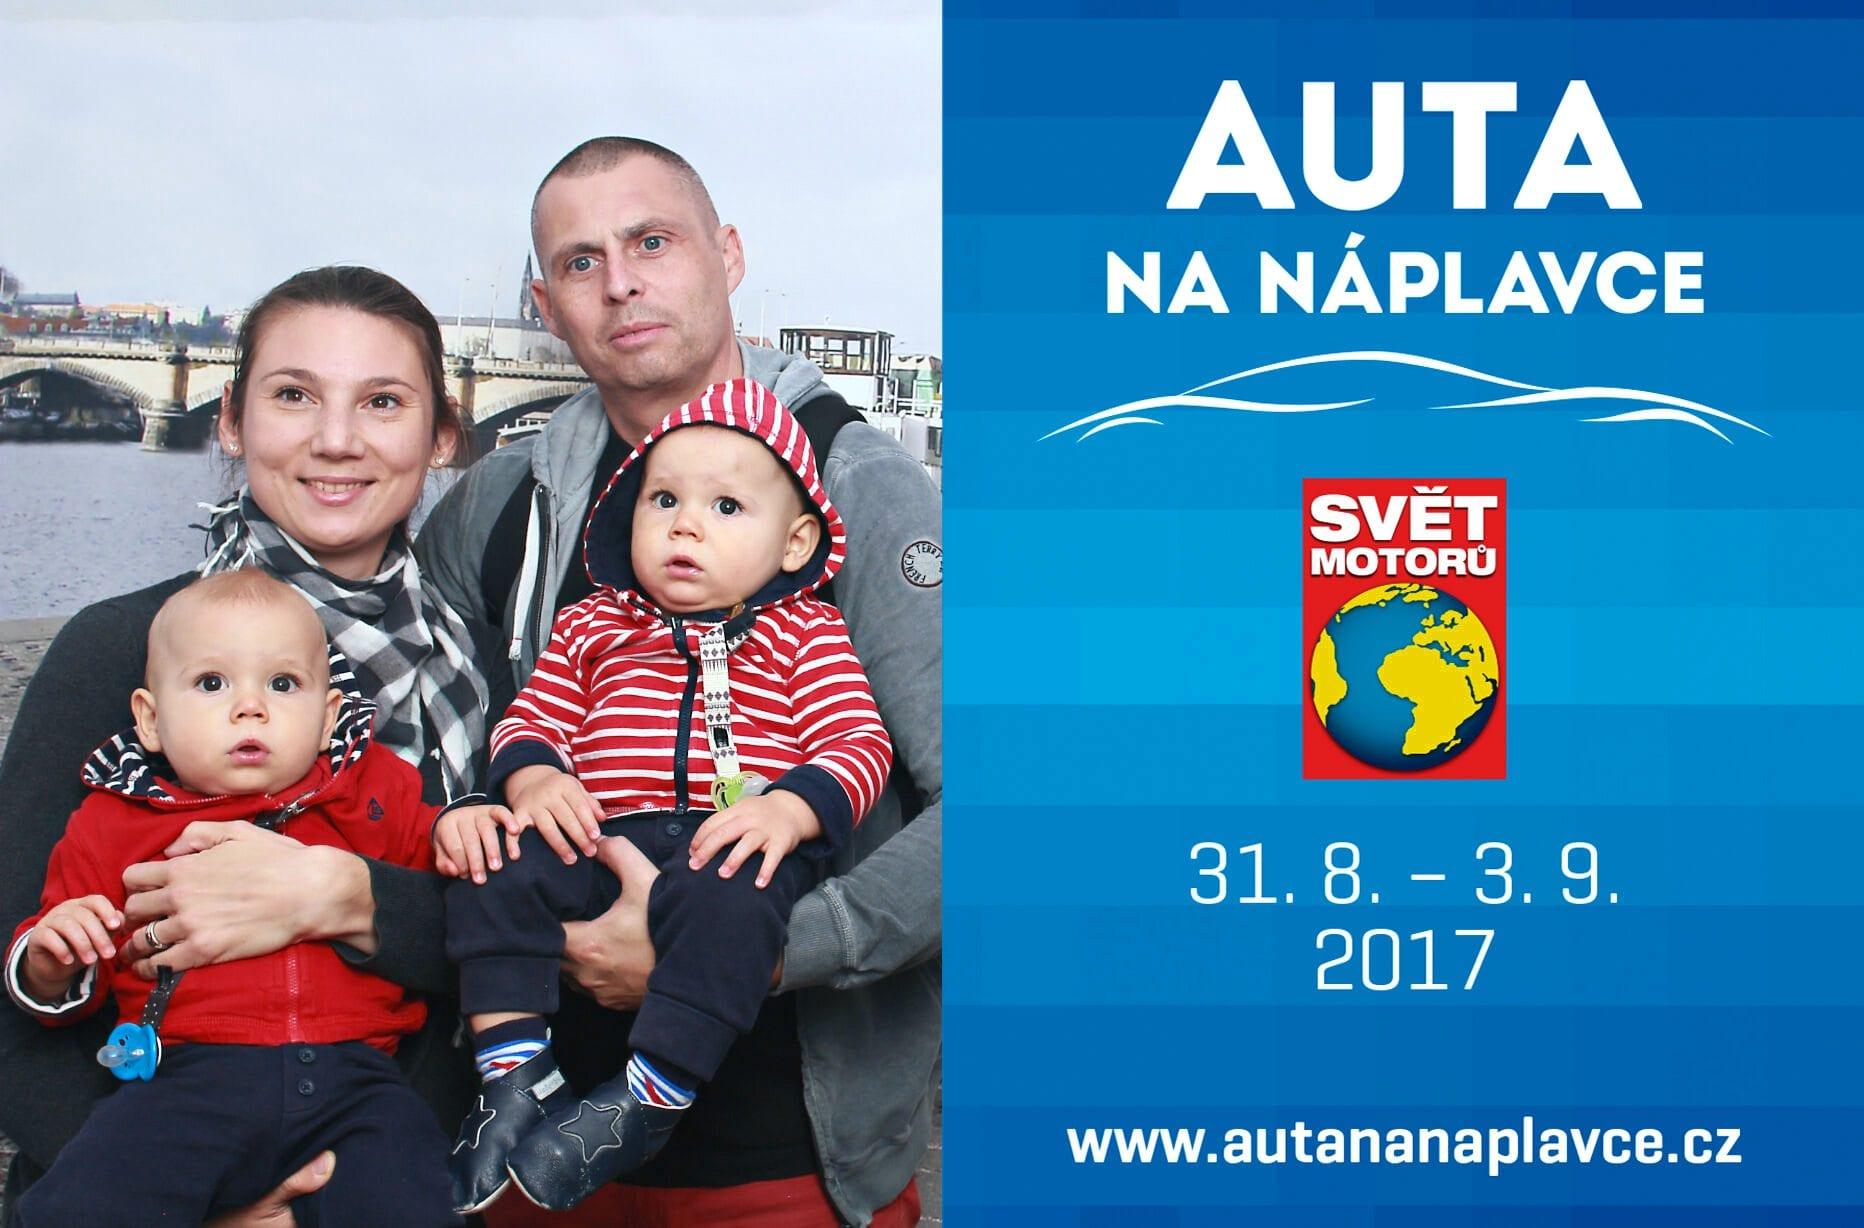 fotokoutek-auta-na-naplavce-3-9-2017-301270